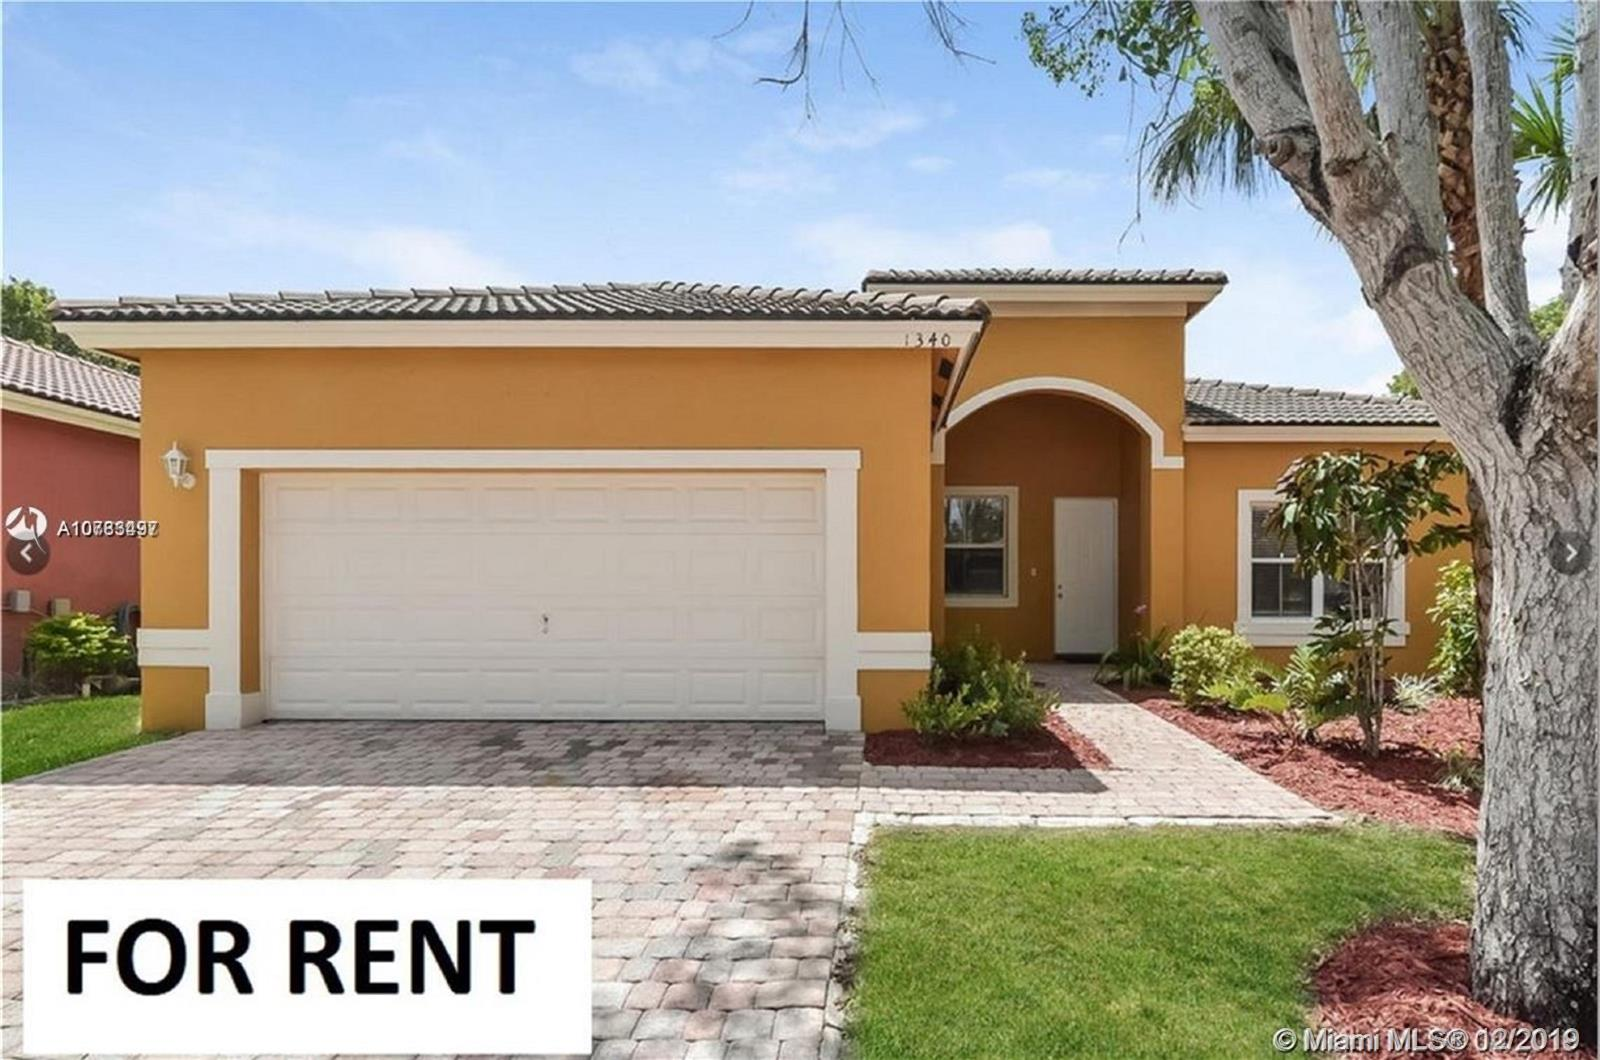 1340 SE 17th Ave, Homestead, FL 33035 - Homestead, FL real estate listing